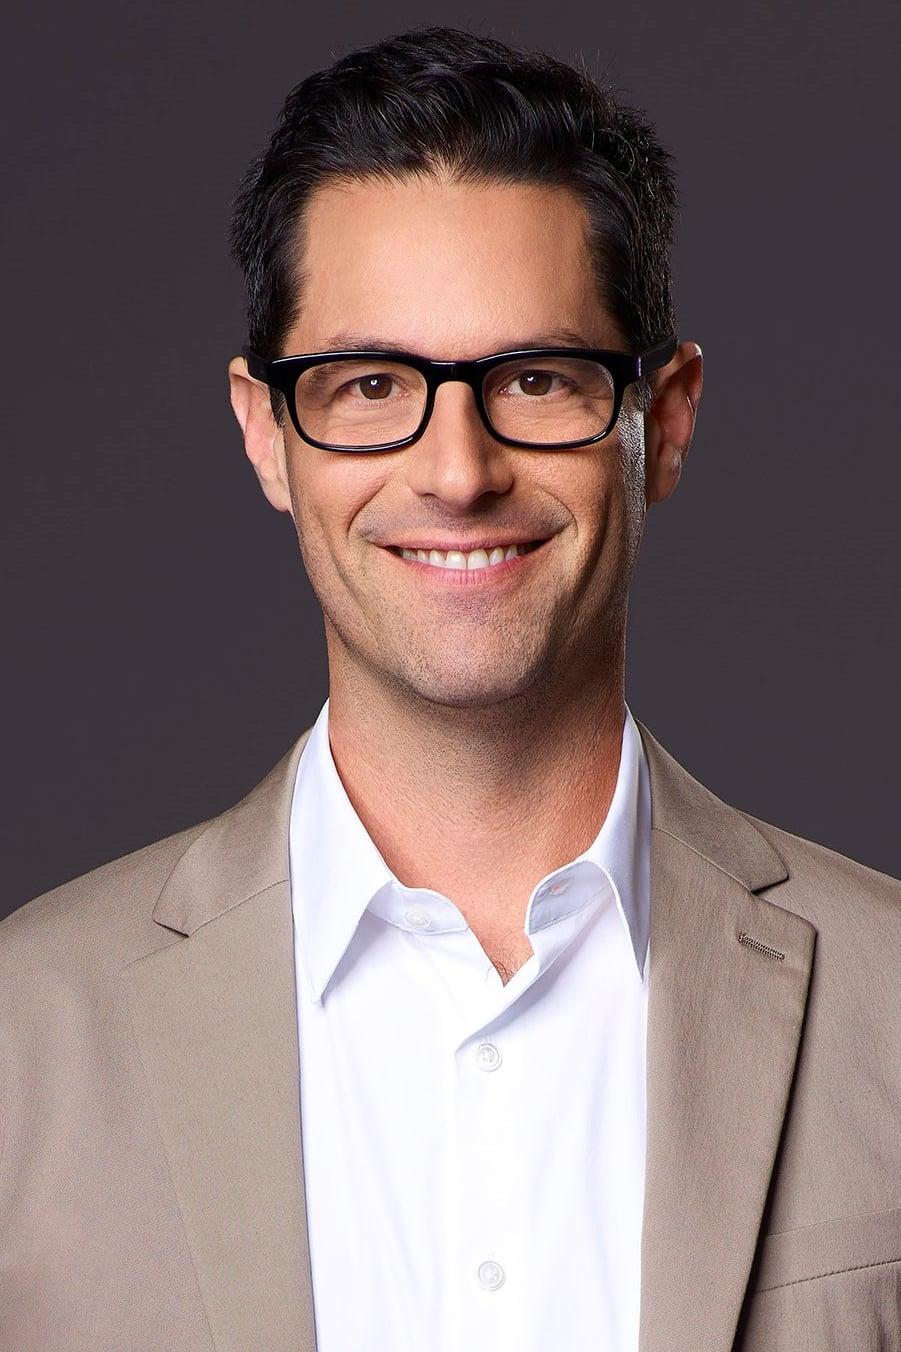 David Schulner